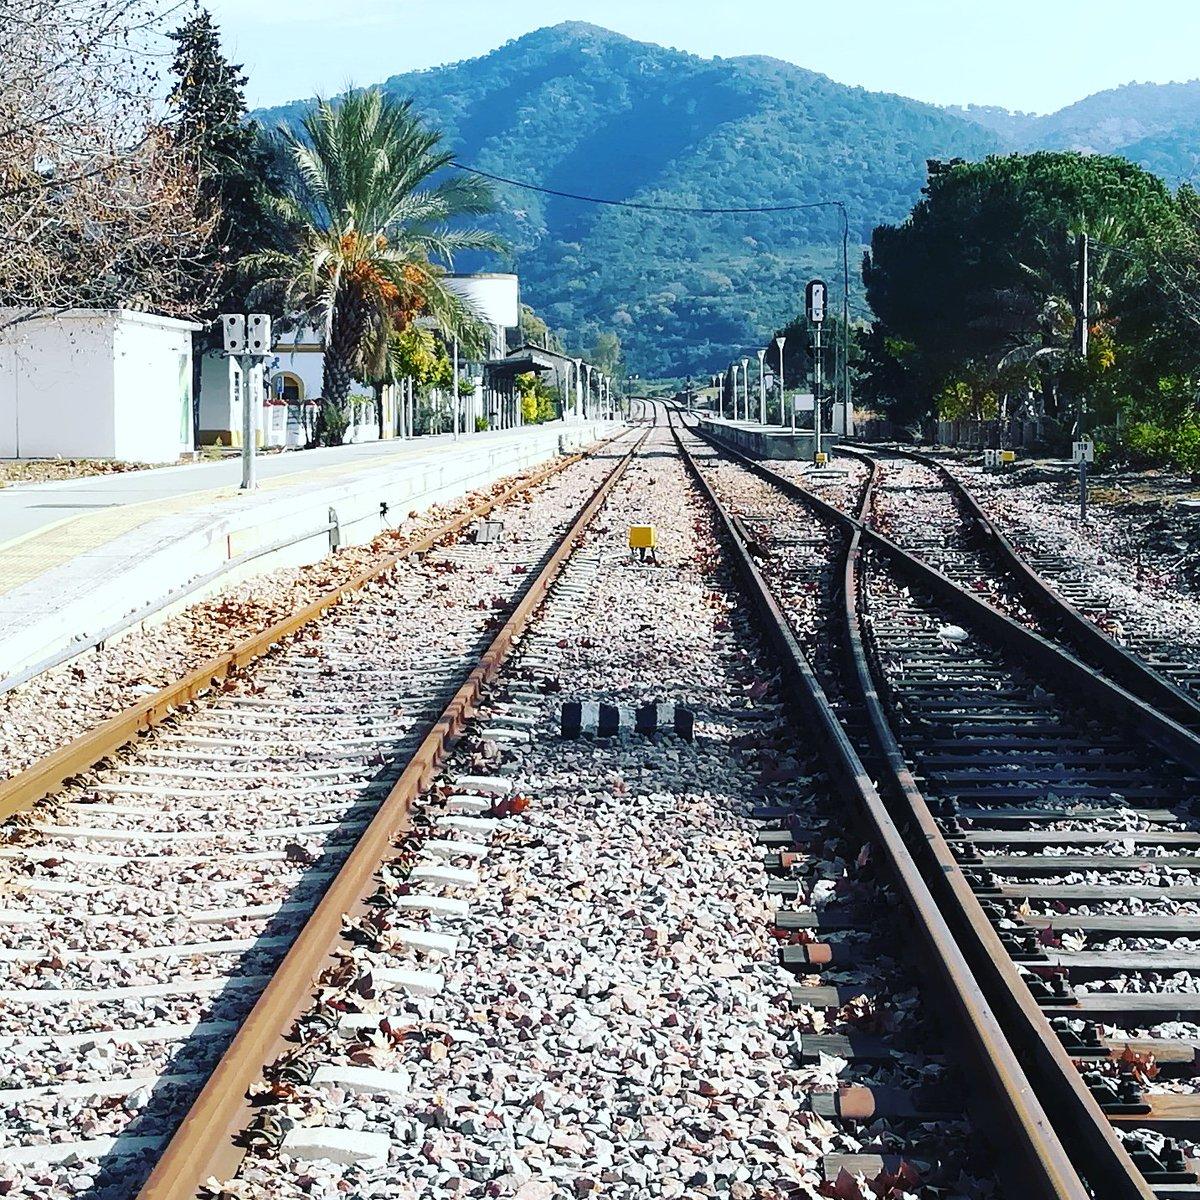 ¿Me pillará el tren? #SinTiempo https://t.co/h8FTfhQ00x